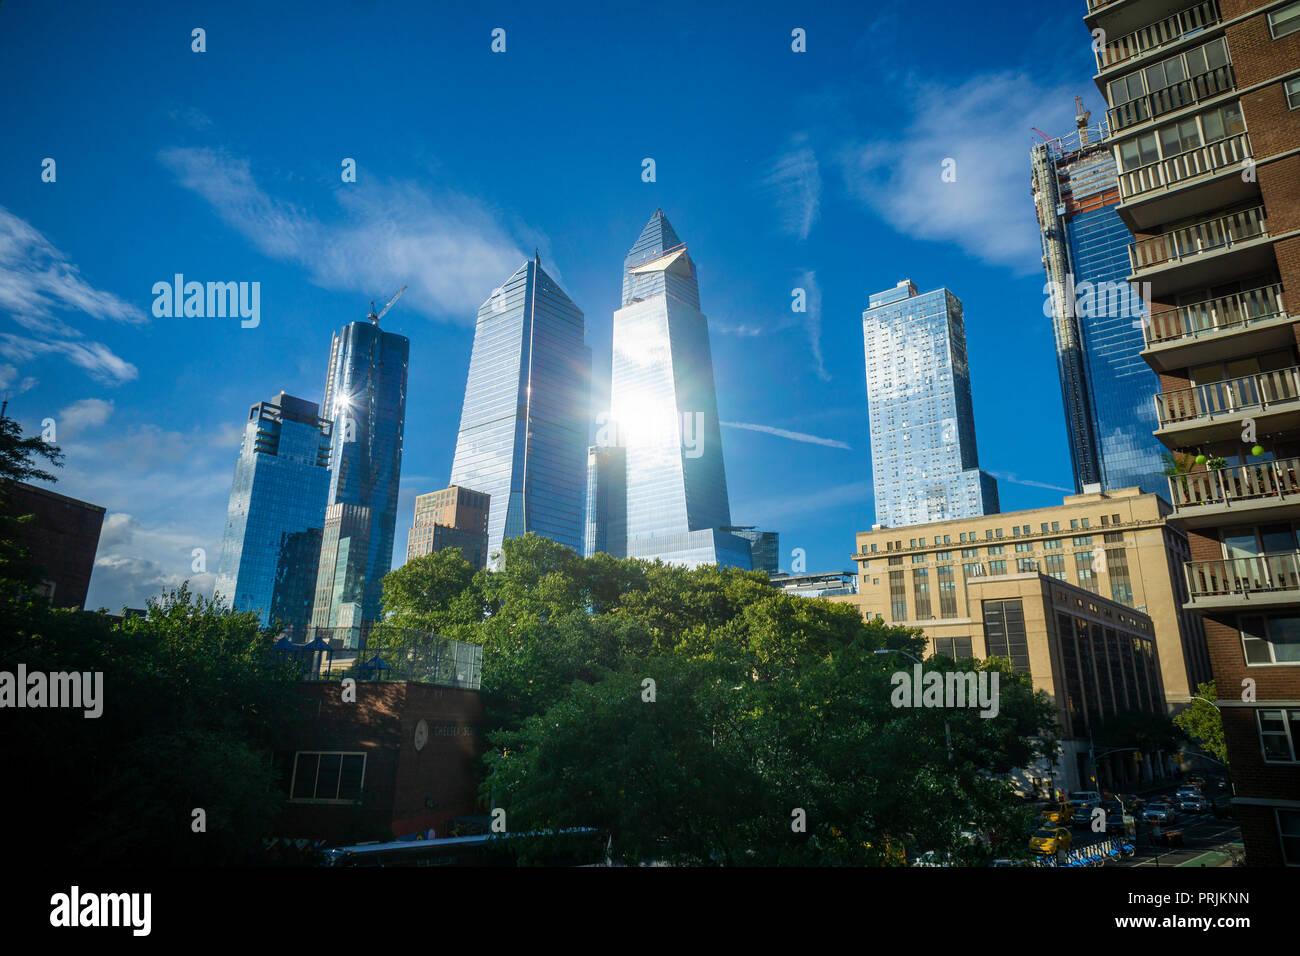 10 Hudson Yards, center left, 30 Hudson Yards, center right, and other development around Hudson Yards in New York on Wednesday, September 26, 2018. (© Richard B. Levine) Stock Photo